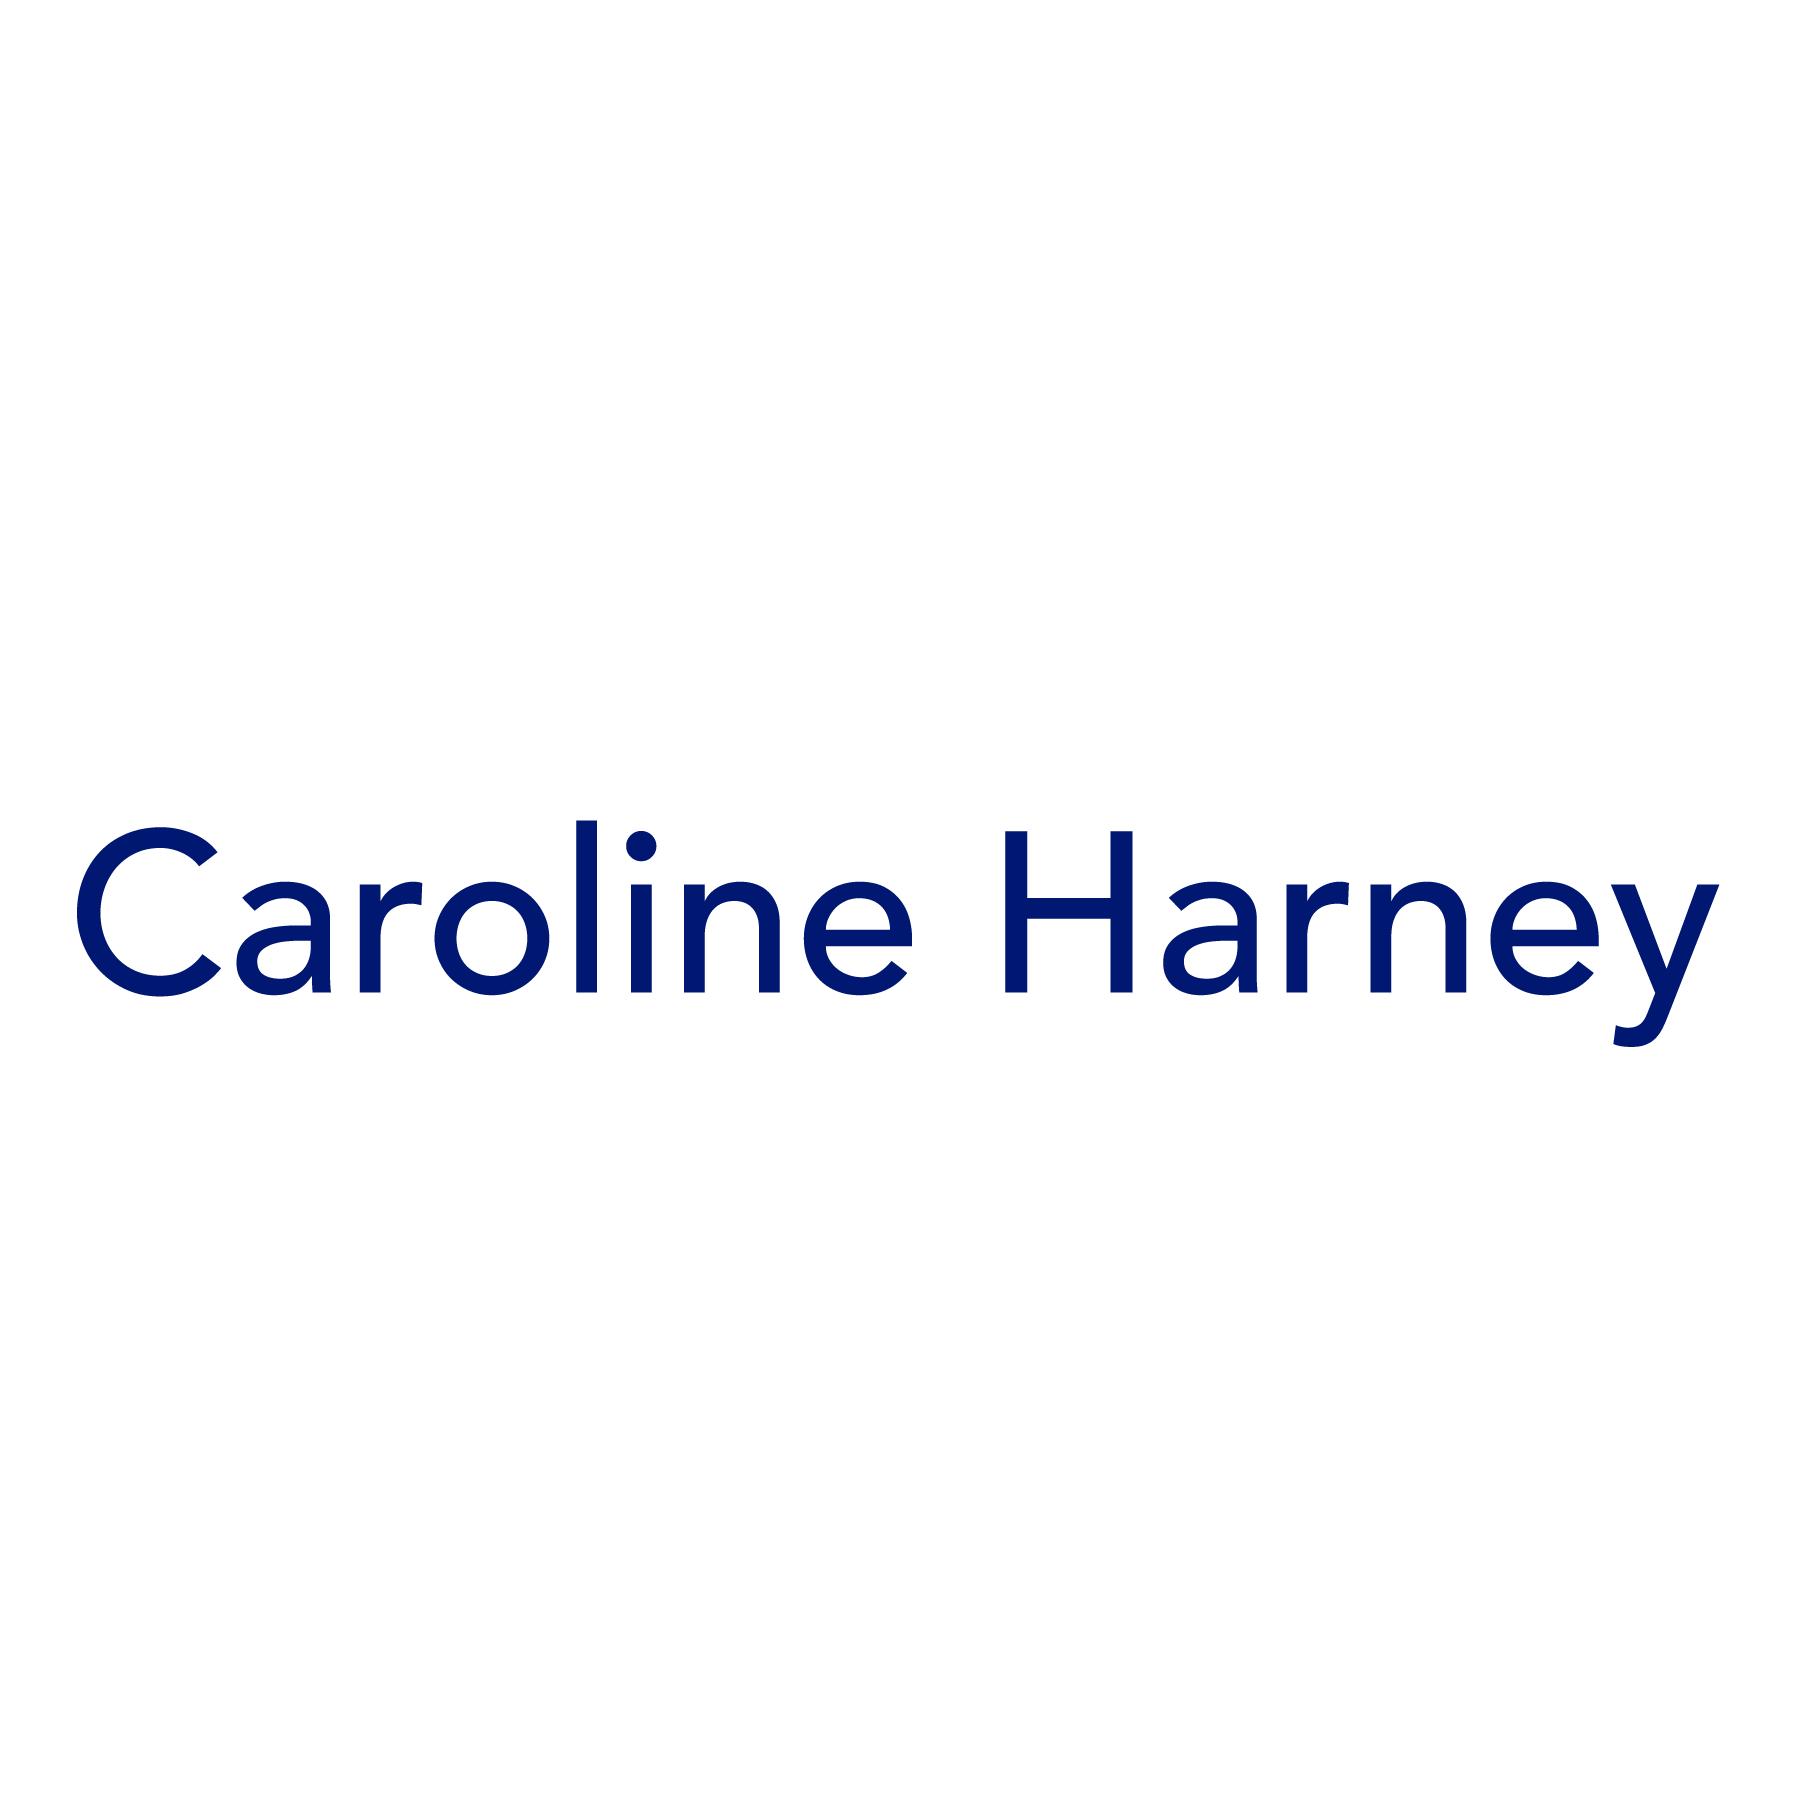 Caroline Harney